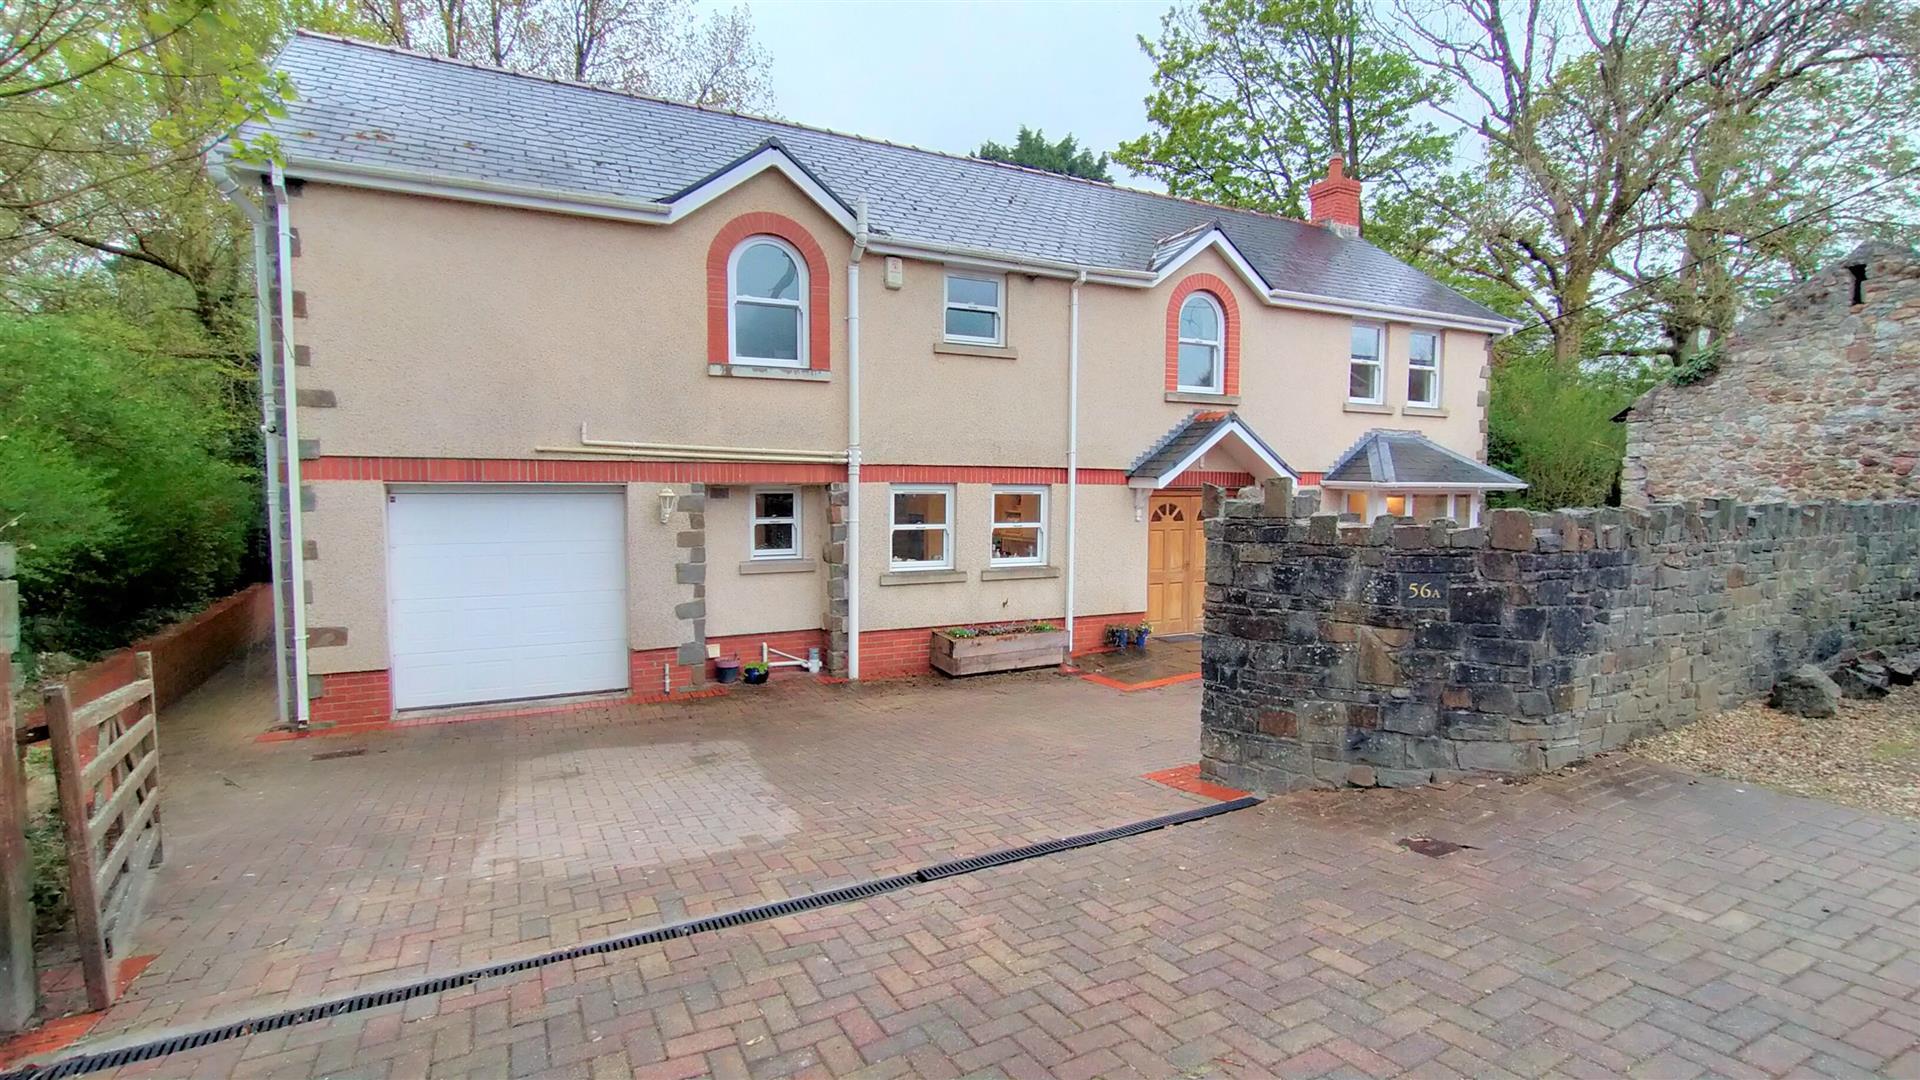 Clyne Forge, 56a Manselfield Road, Murton, Swansea, SA3 3AP